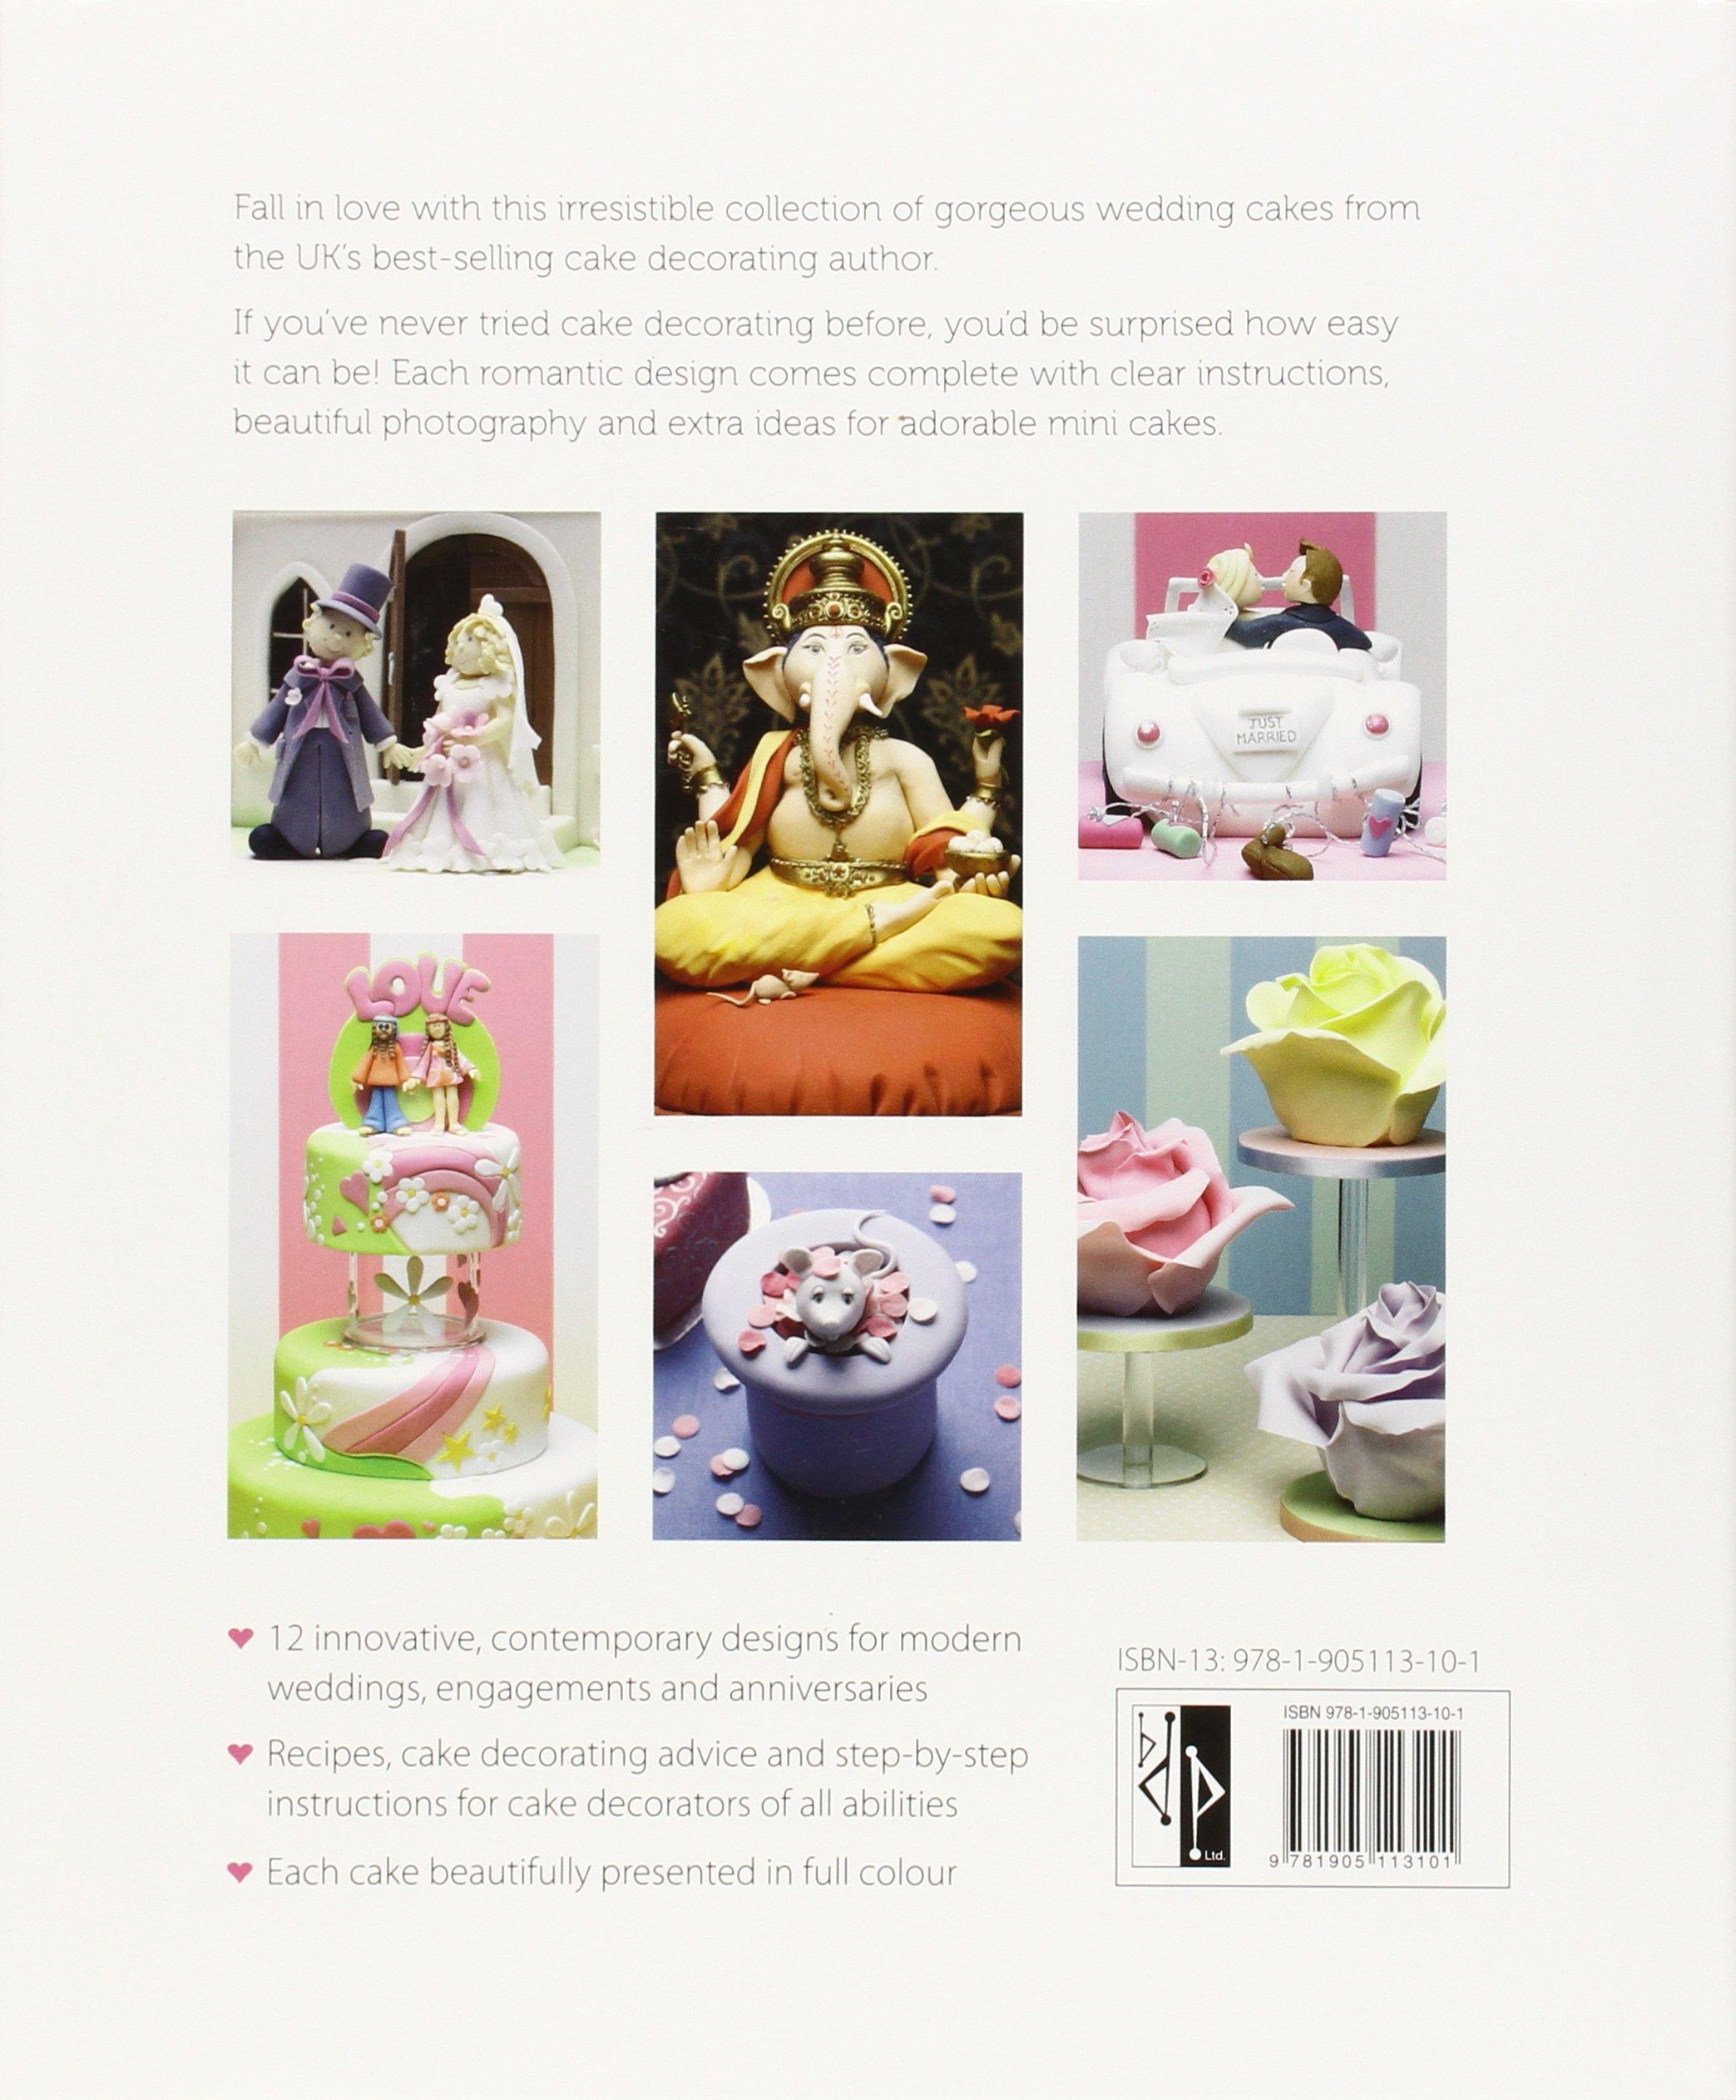 Debbie Brown\'s Dream Wedding Cakes: Gorgeous Designs for Weddings ...